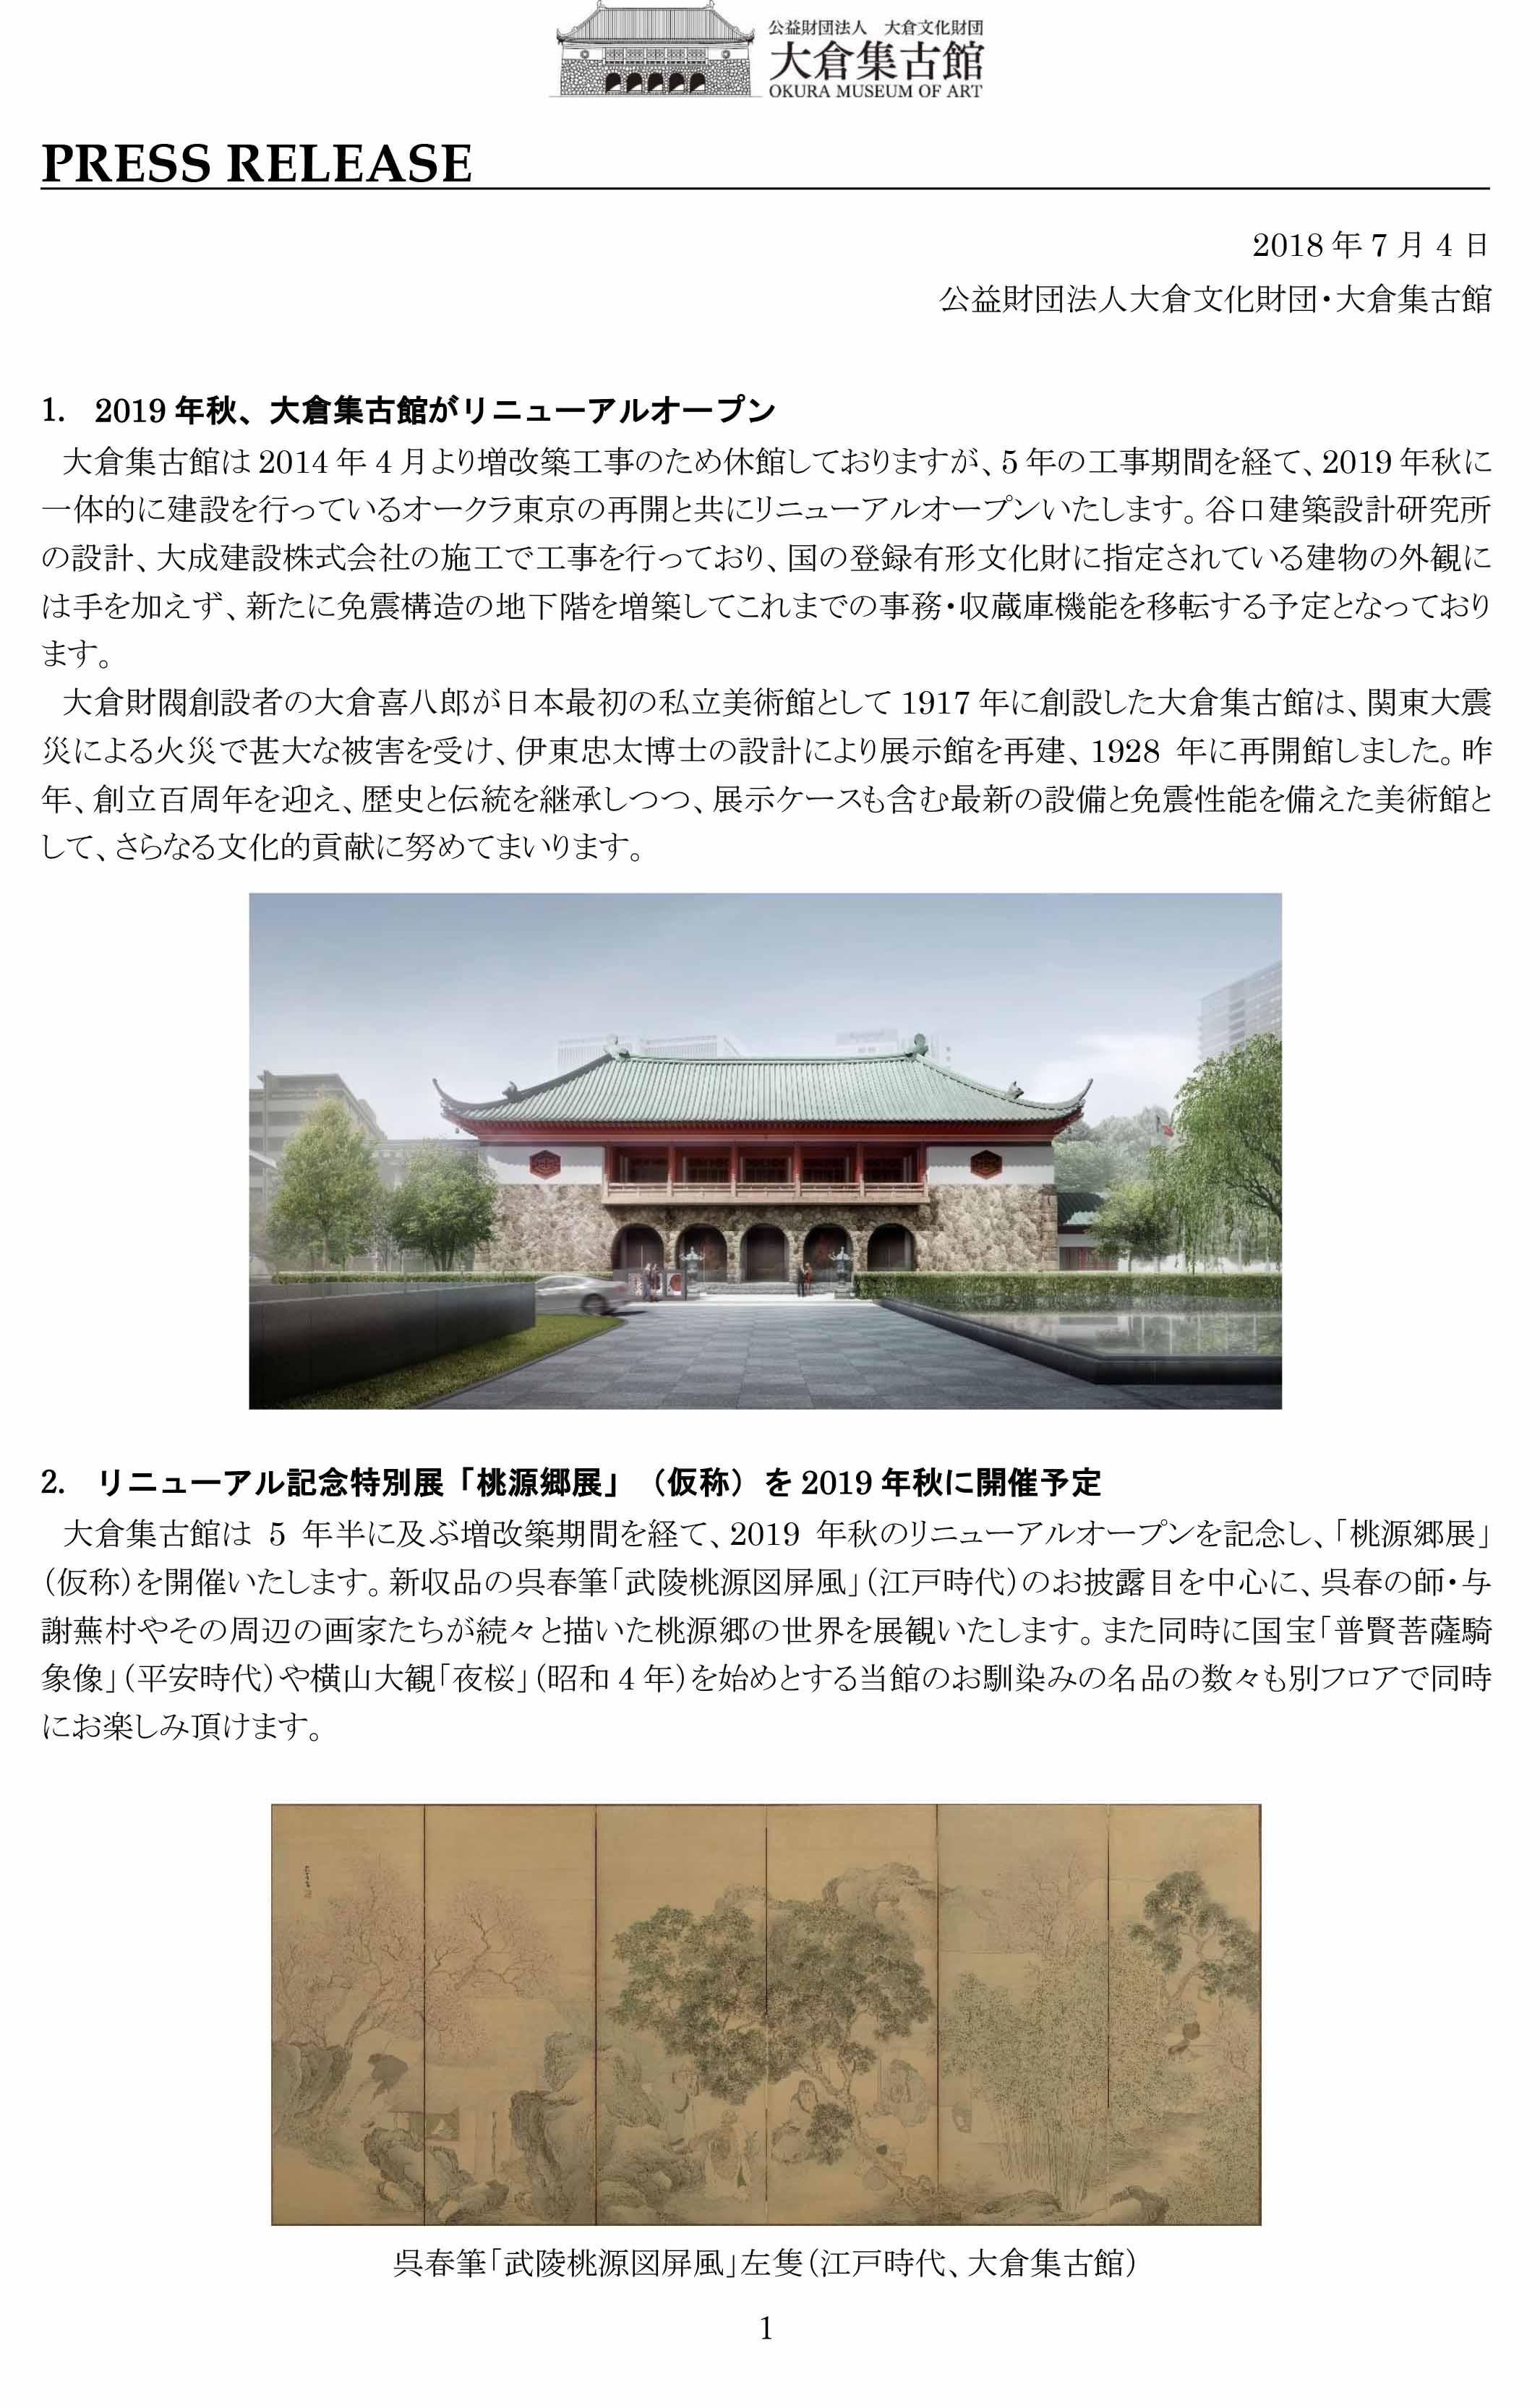 f:id:shukokan:20180712165643j:image